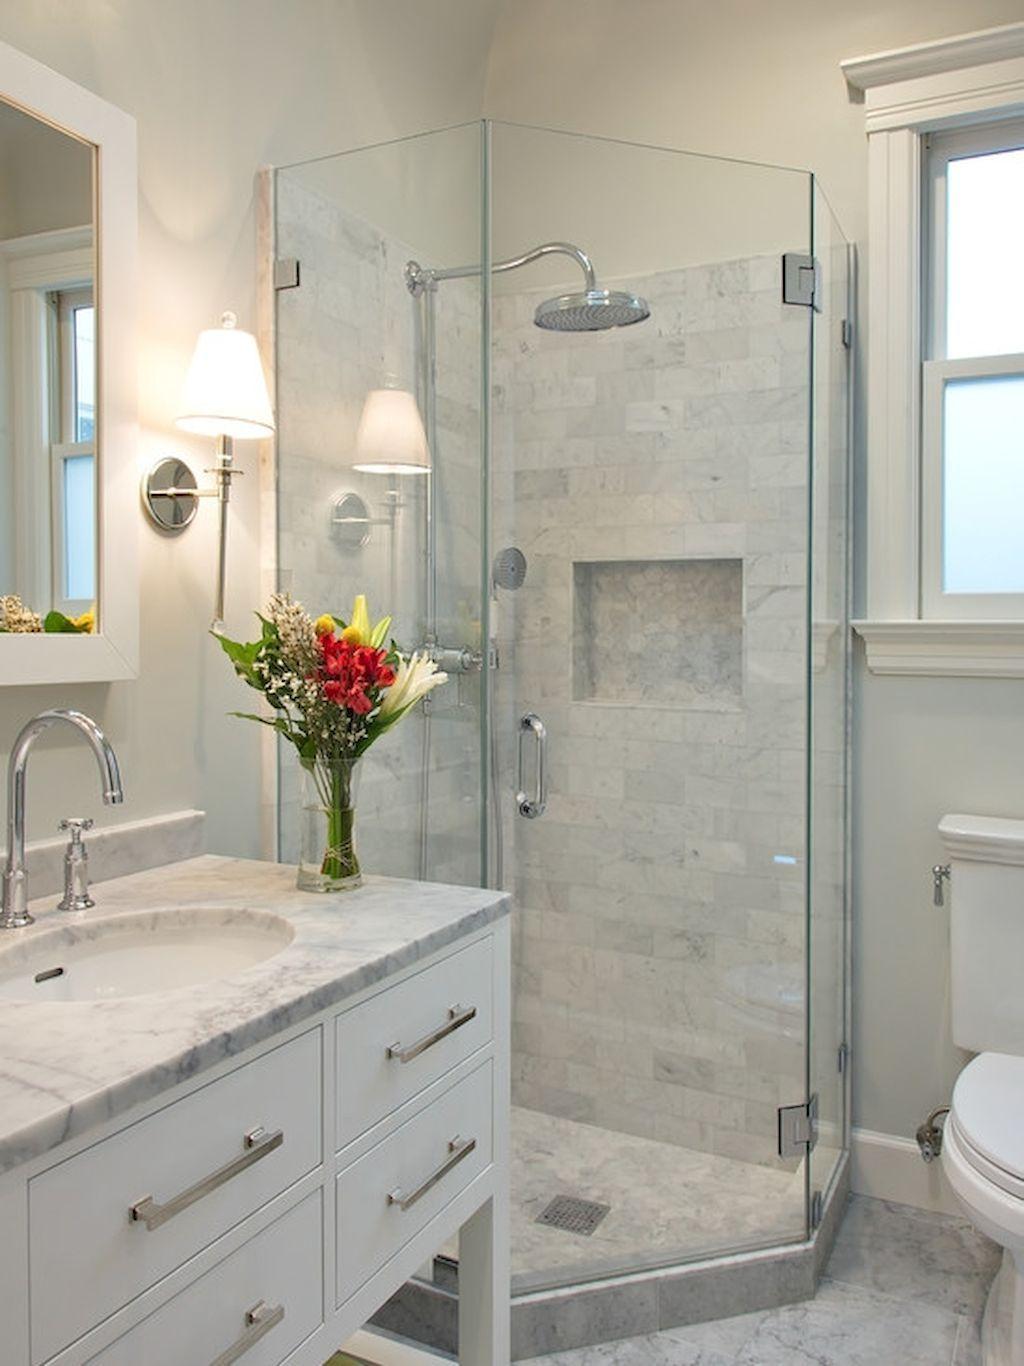 fresh small master bathroom remodel ideas on a budget 40 on bathroom renovation ideas white id=76782